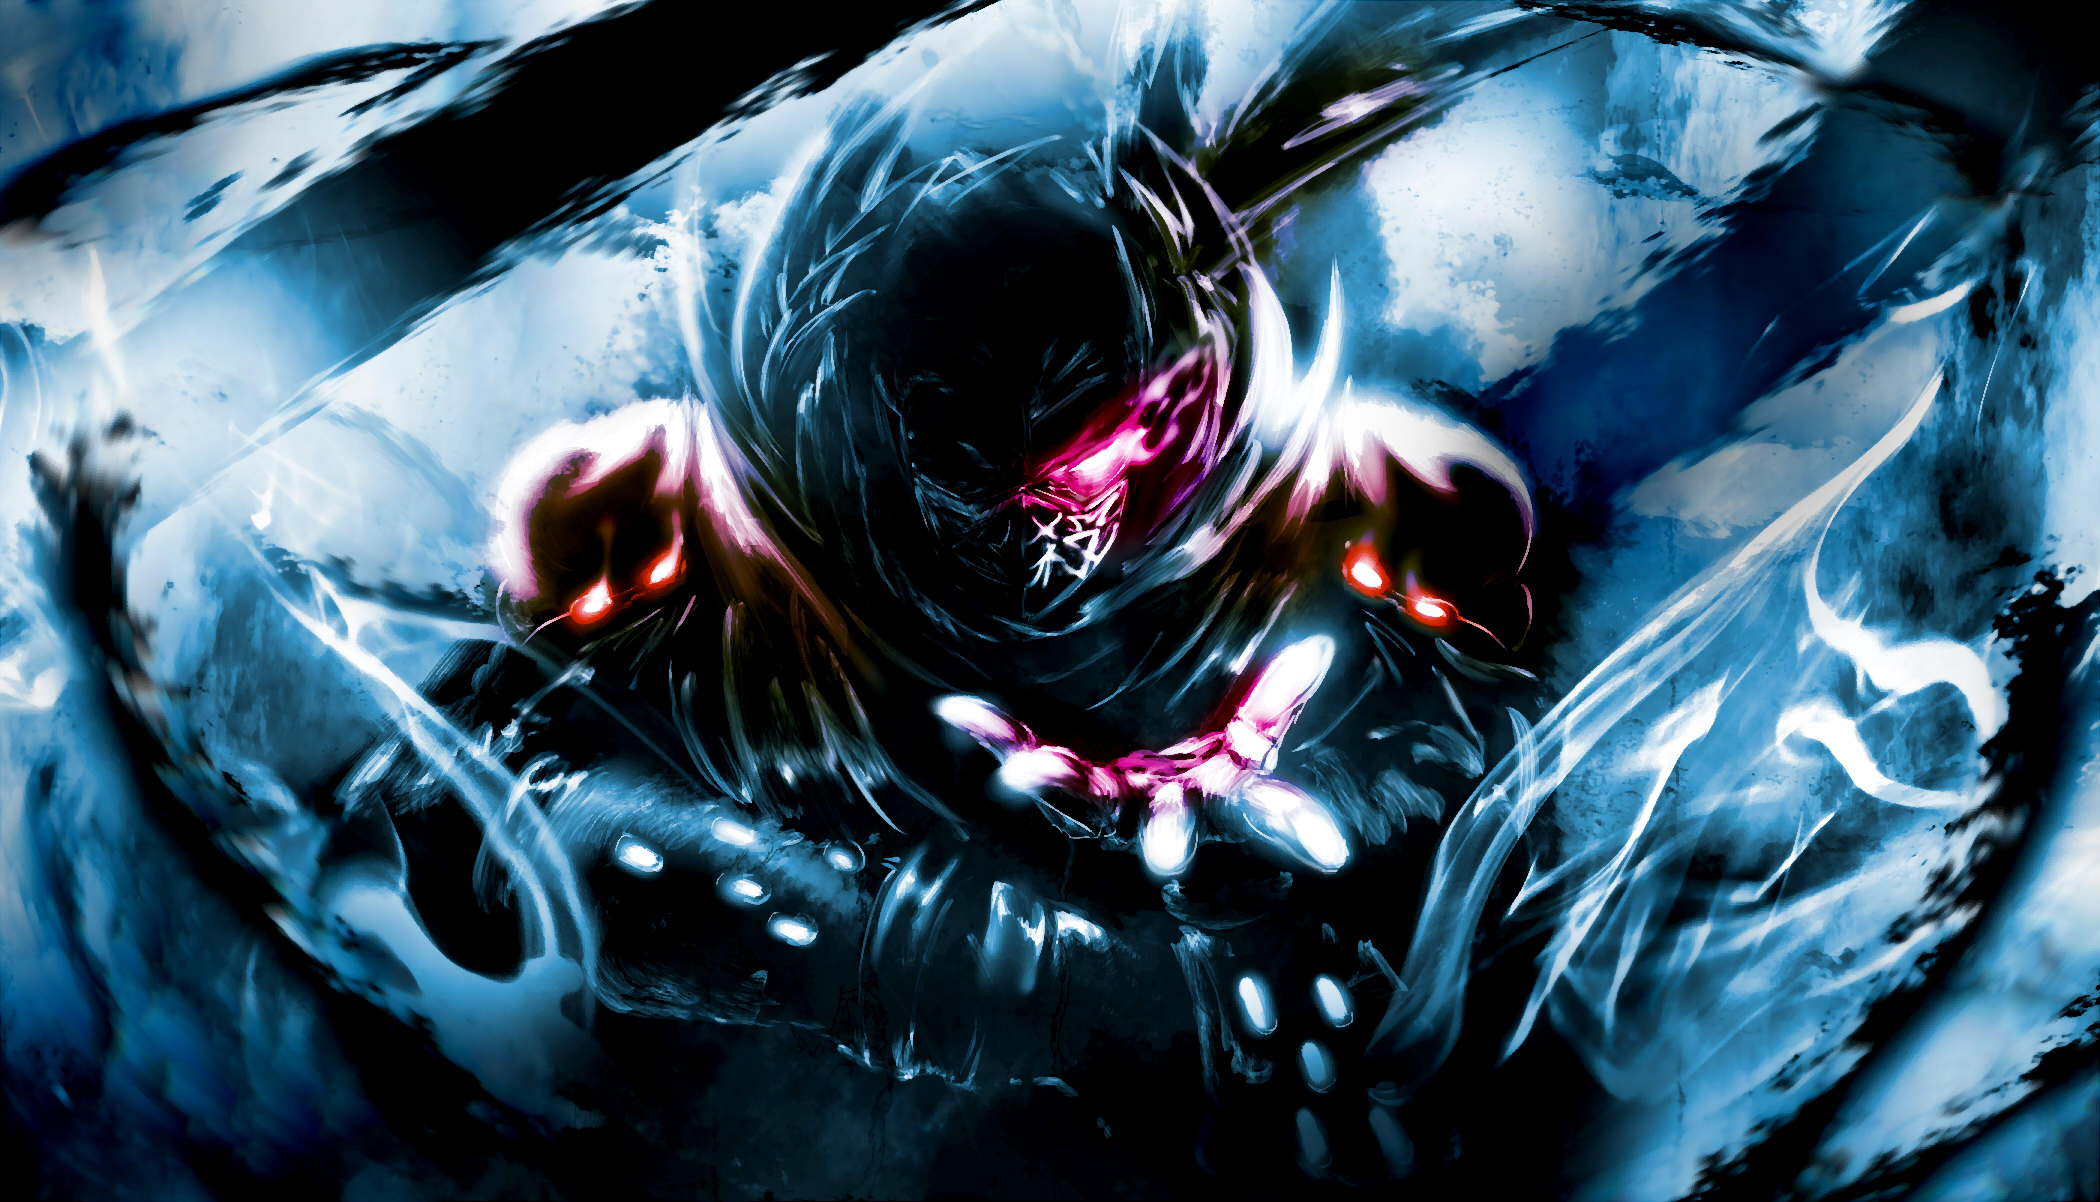 Zed Galaxy Slayer Wallpaper Hd 4k: Ninja Slayer Zed Where?